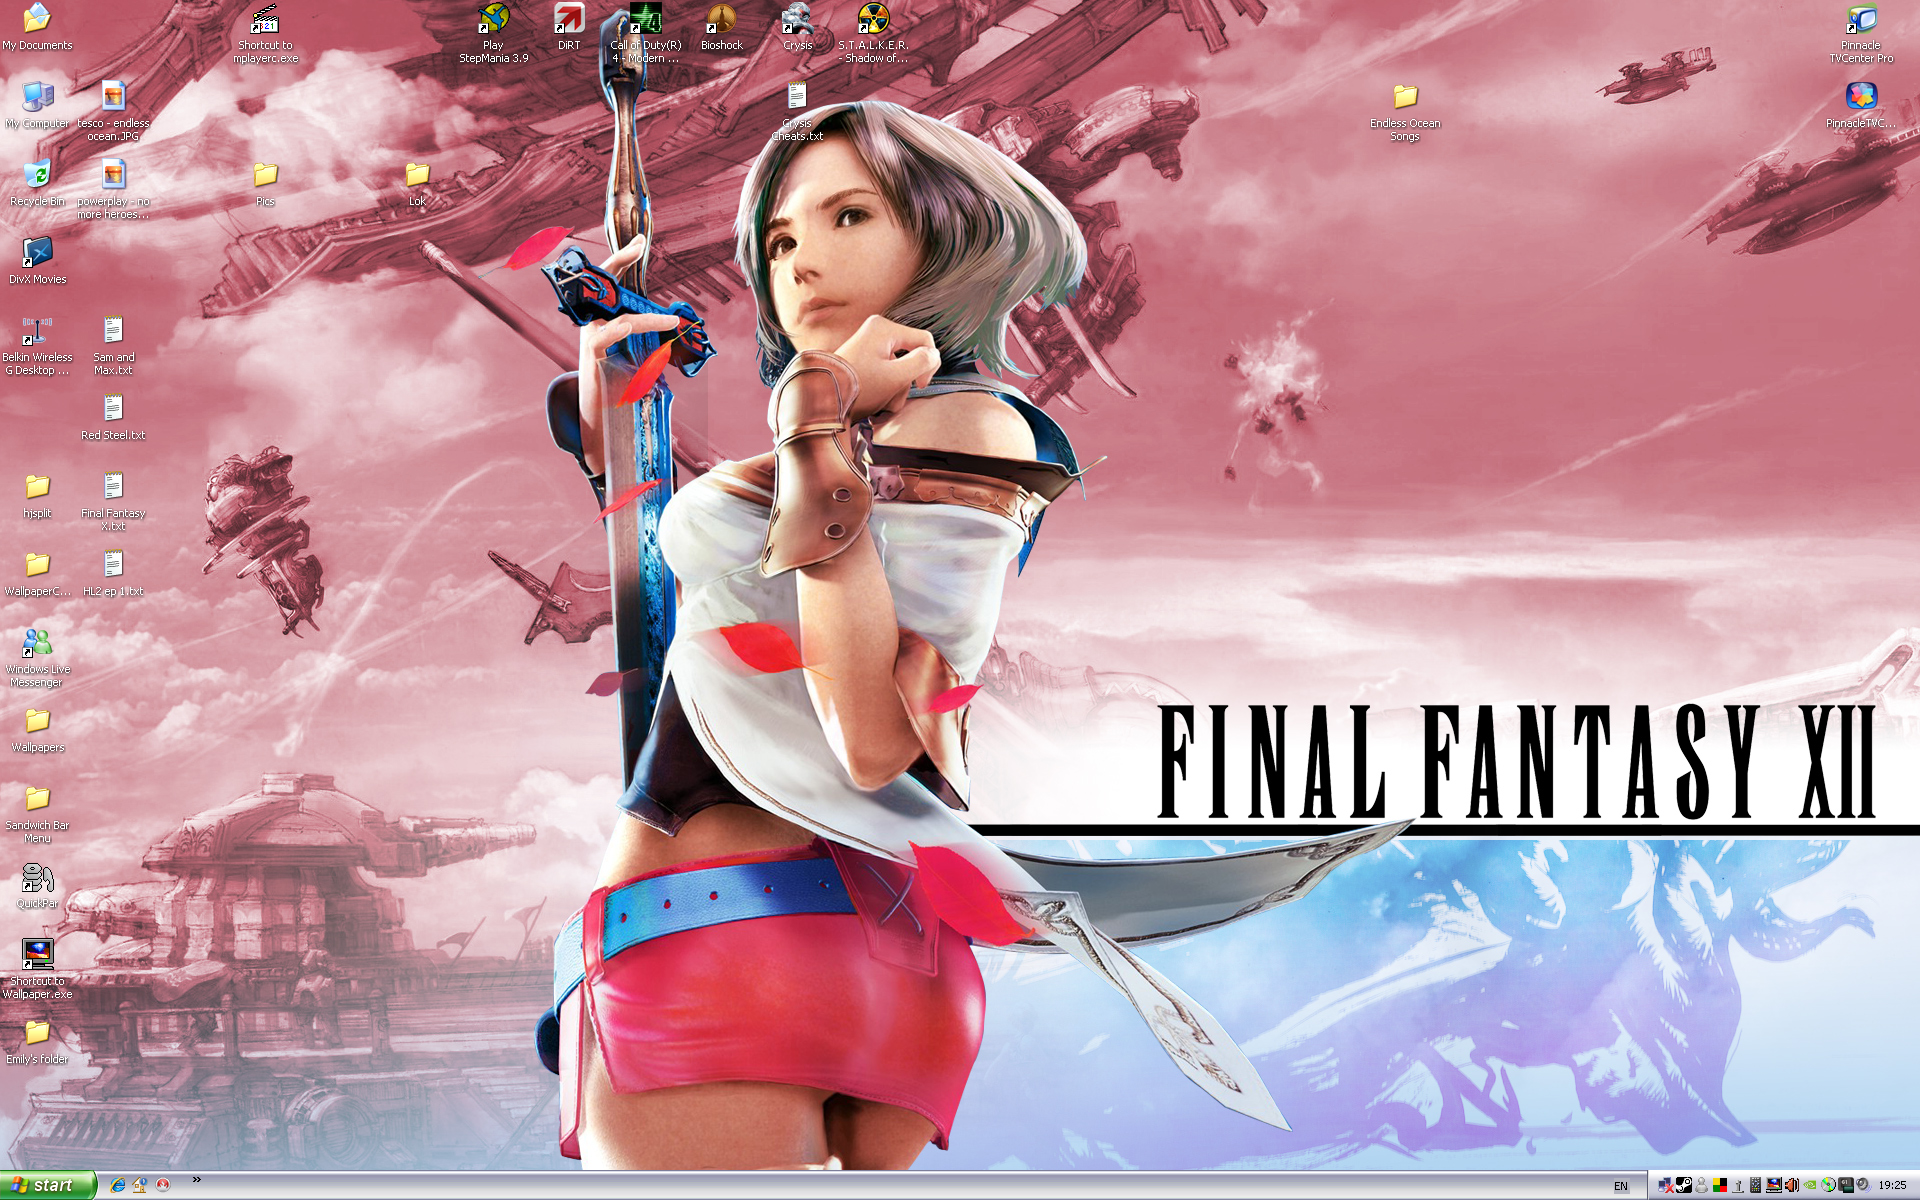 Final fantasy xii hd wallpaper - Final fantasy phone wallpaper ...